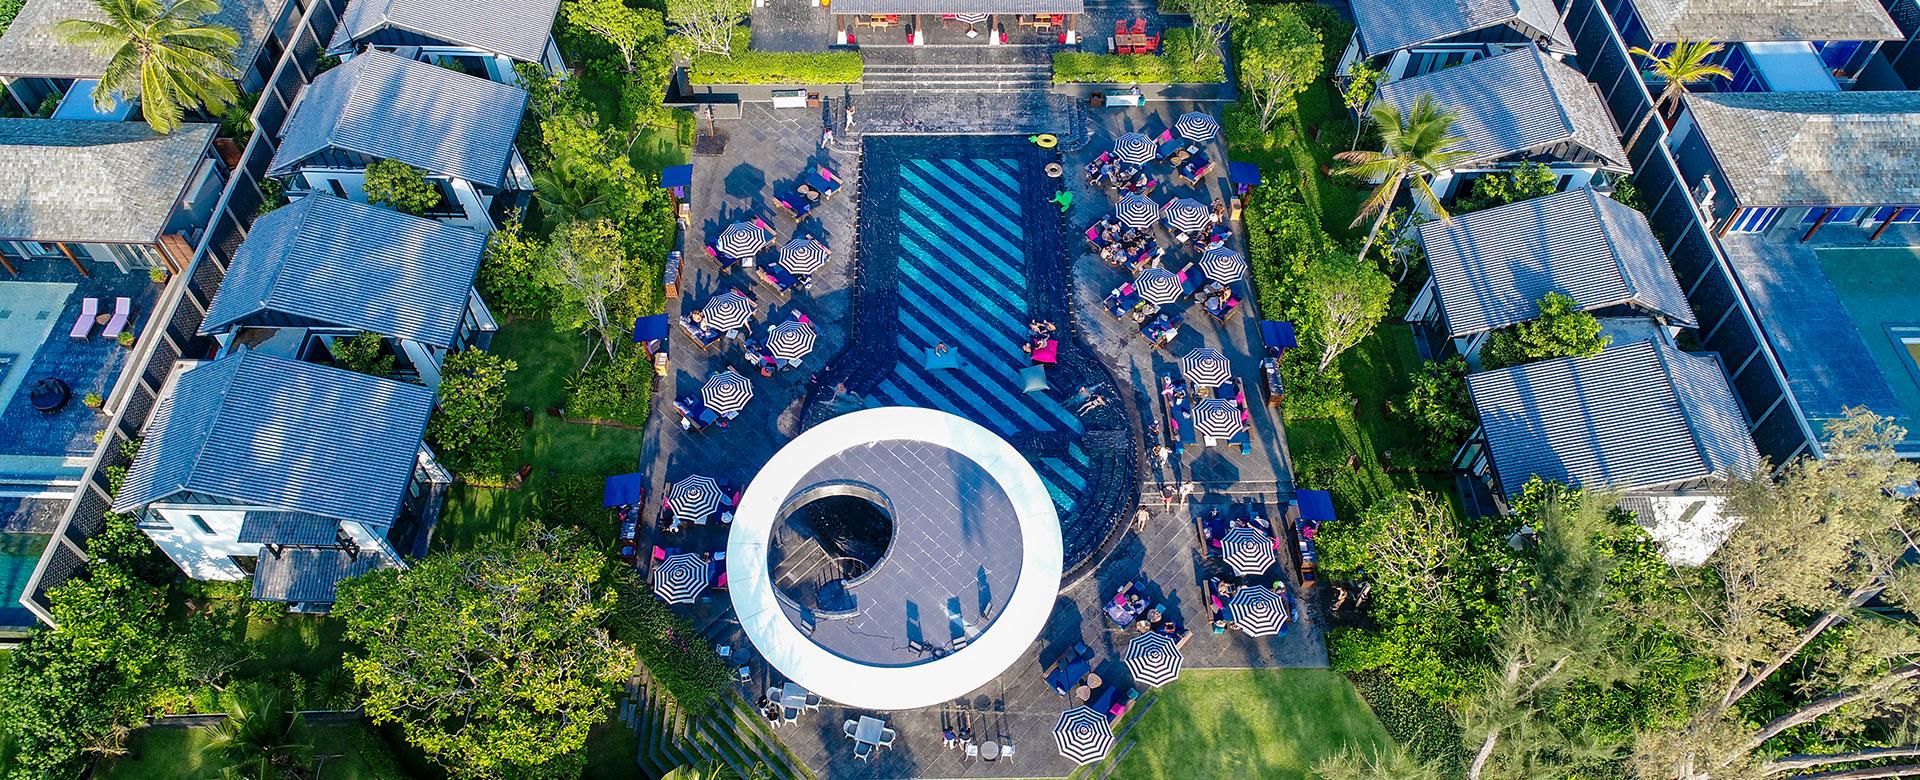 3-Facilities-Baba-Beach-Club-Luxury-Hotel-Phuket-by-Sri-Panwa